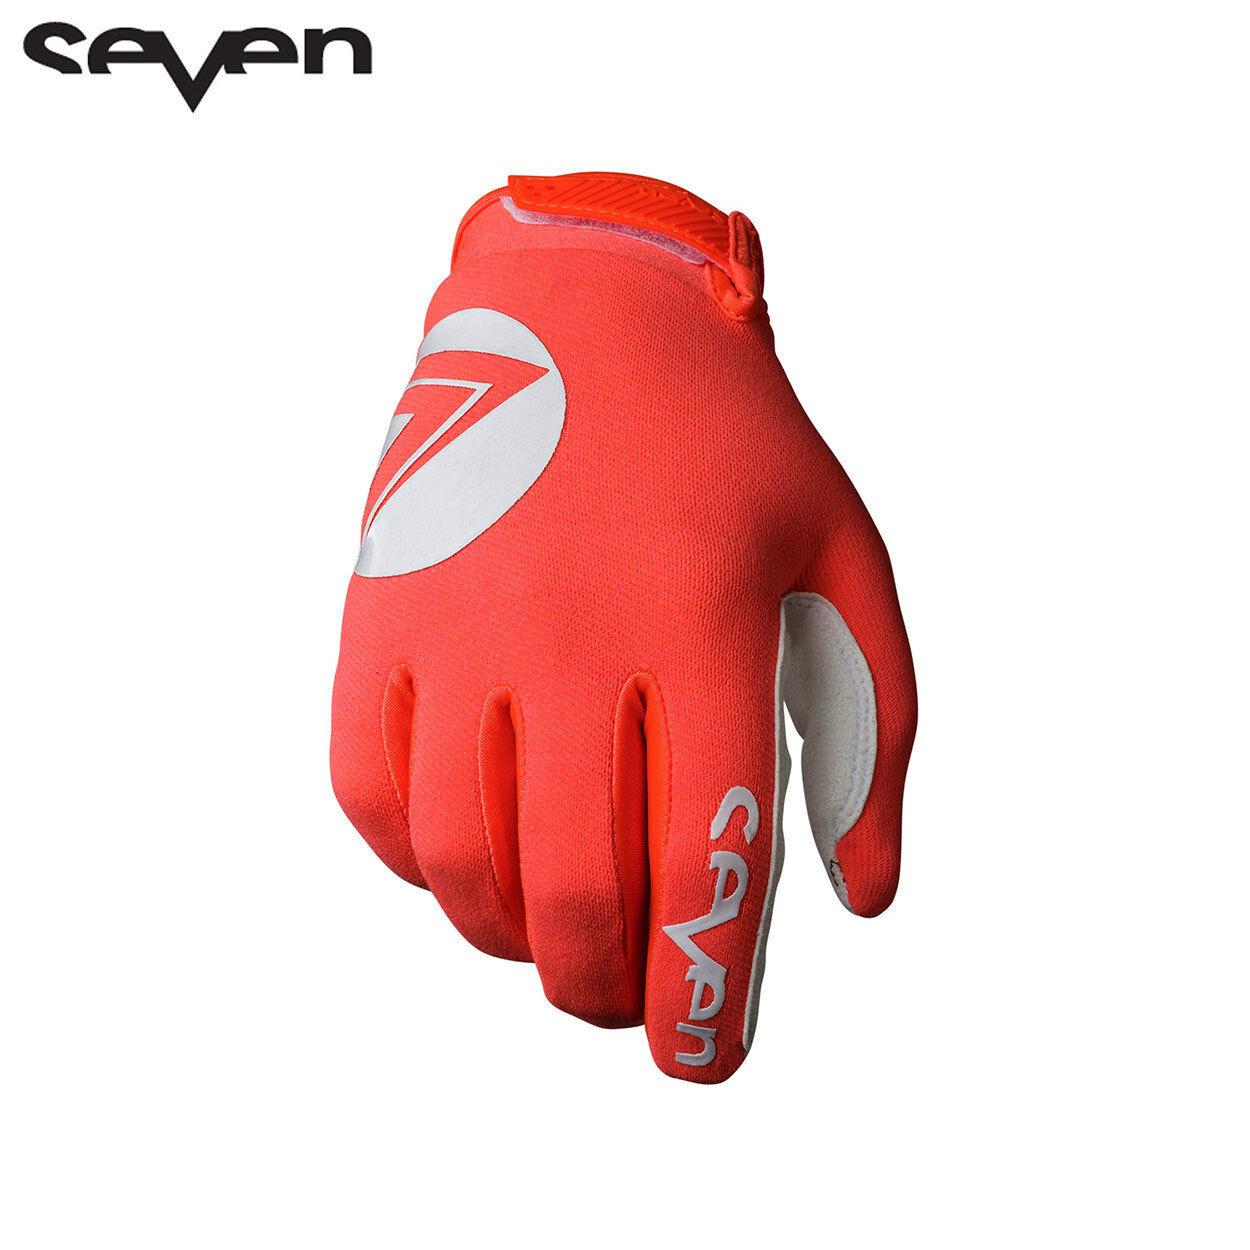 Seven Mx Coral 2019 Annex 7 Dot Gloves